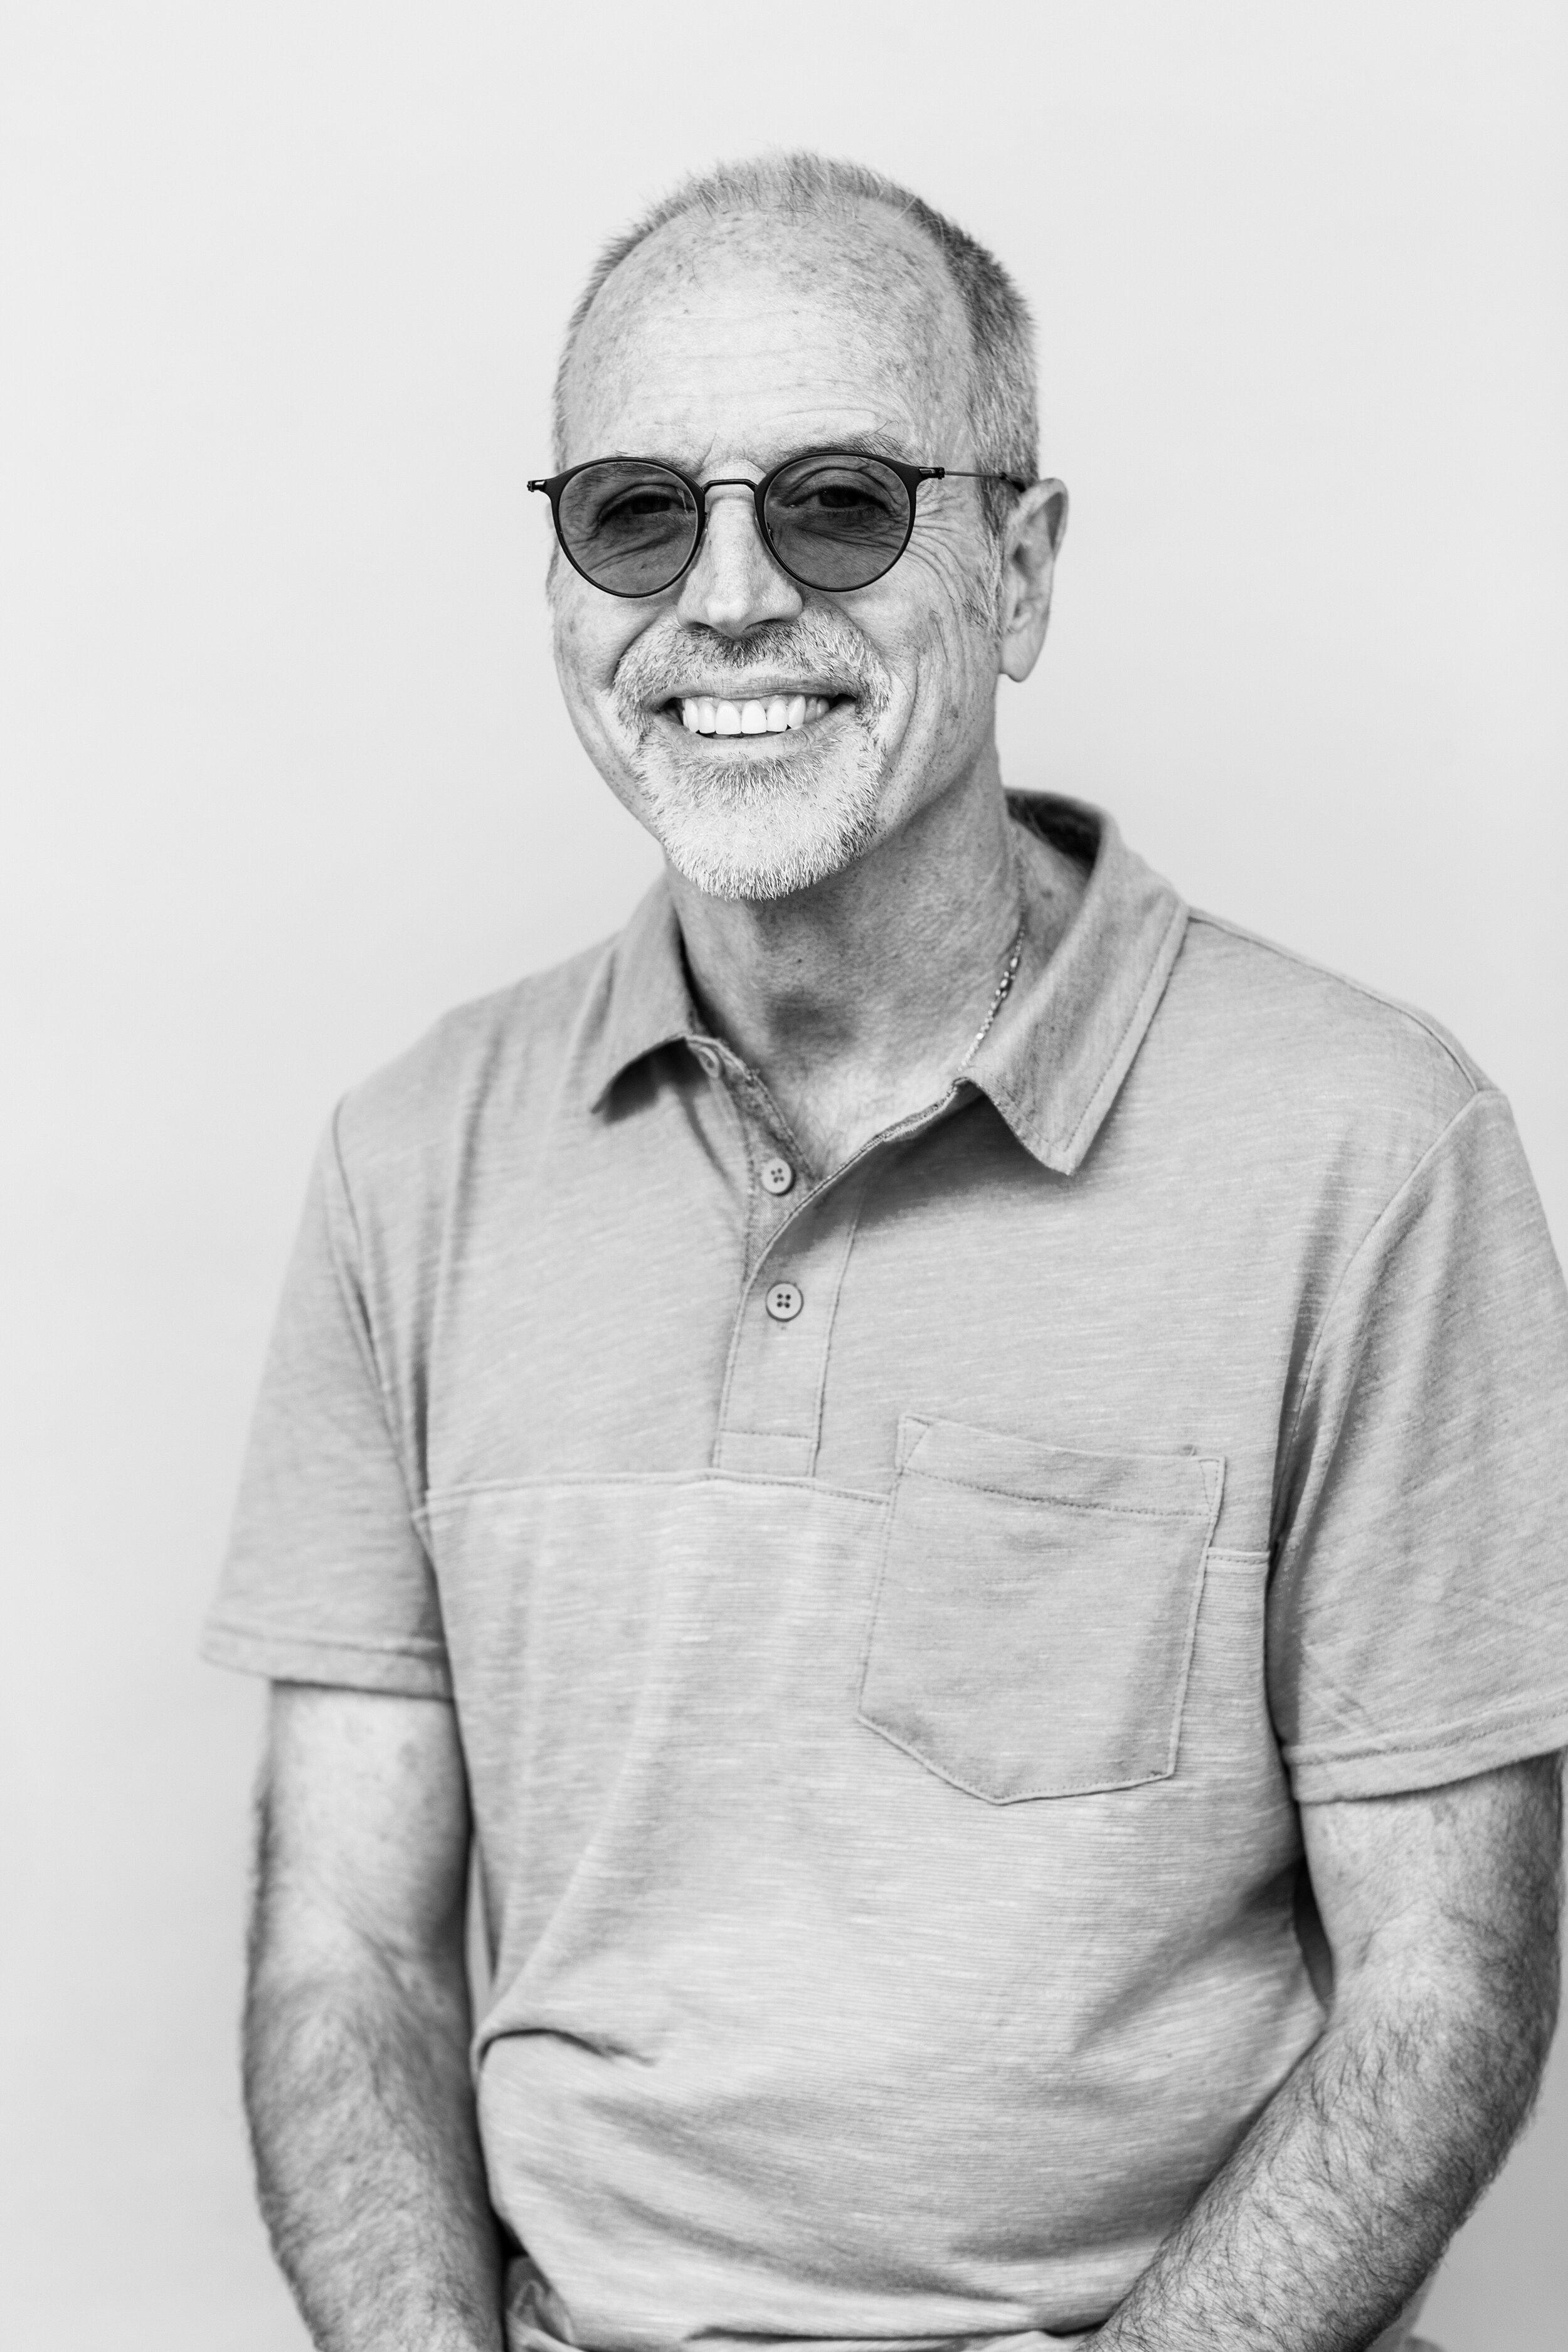 Robert bruning - MAKEWAVESMUSIC CEO